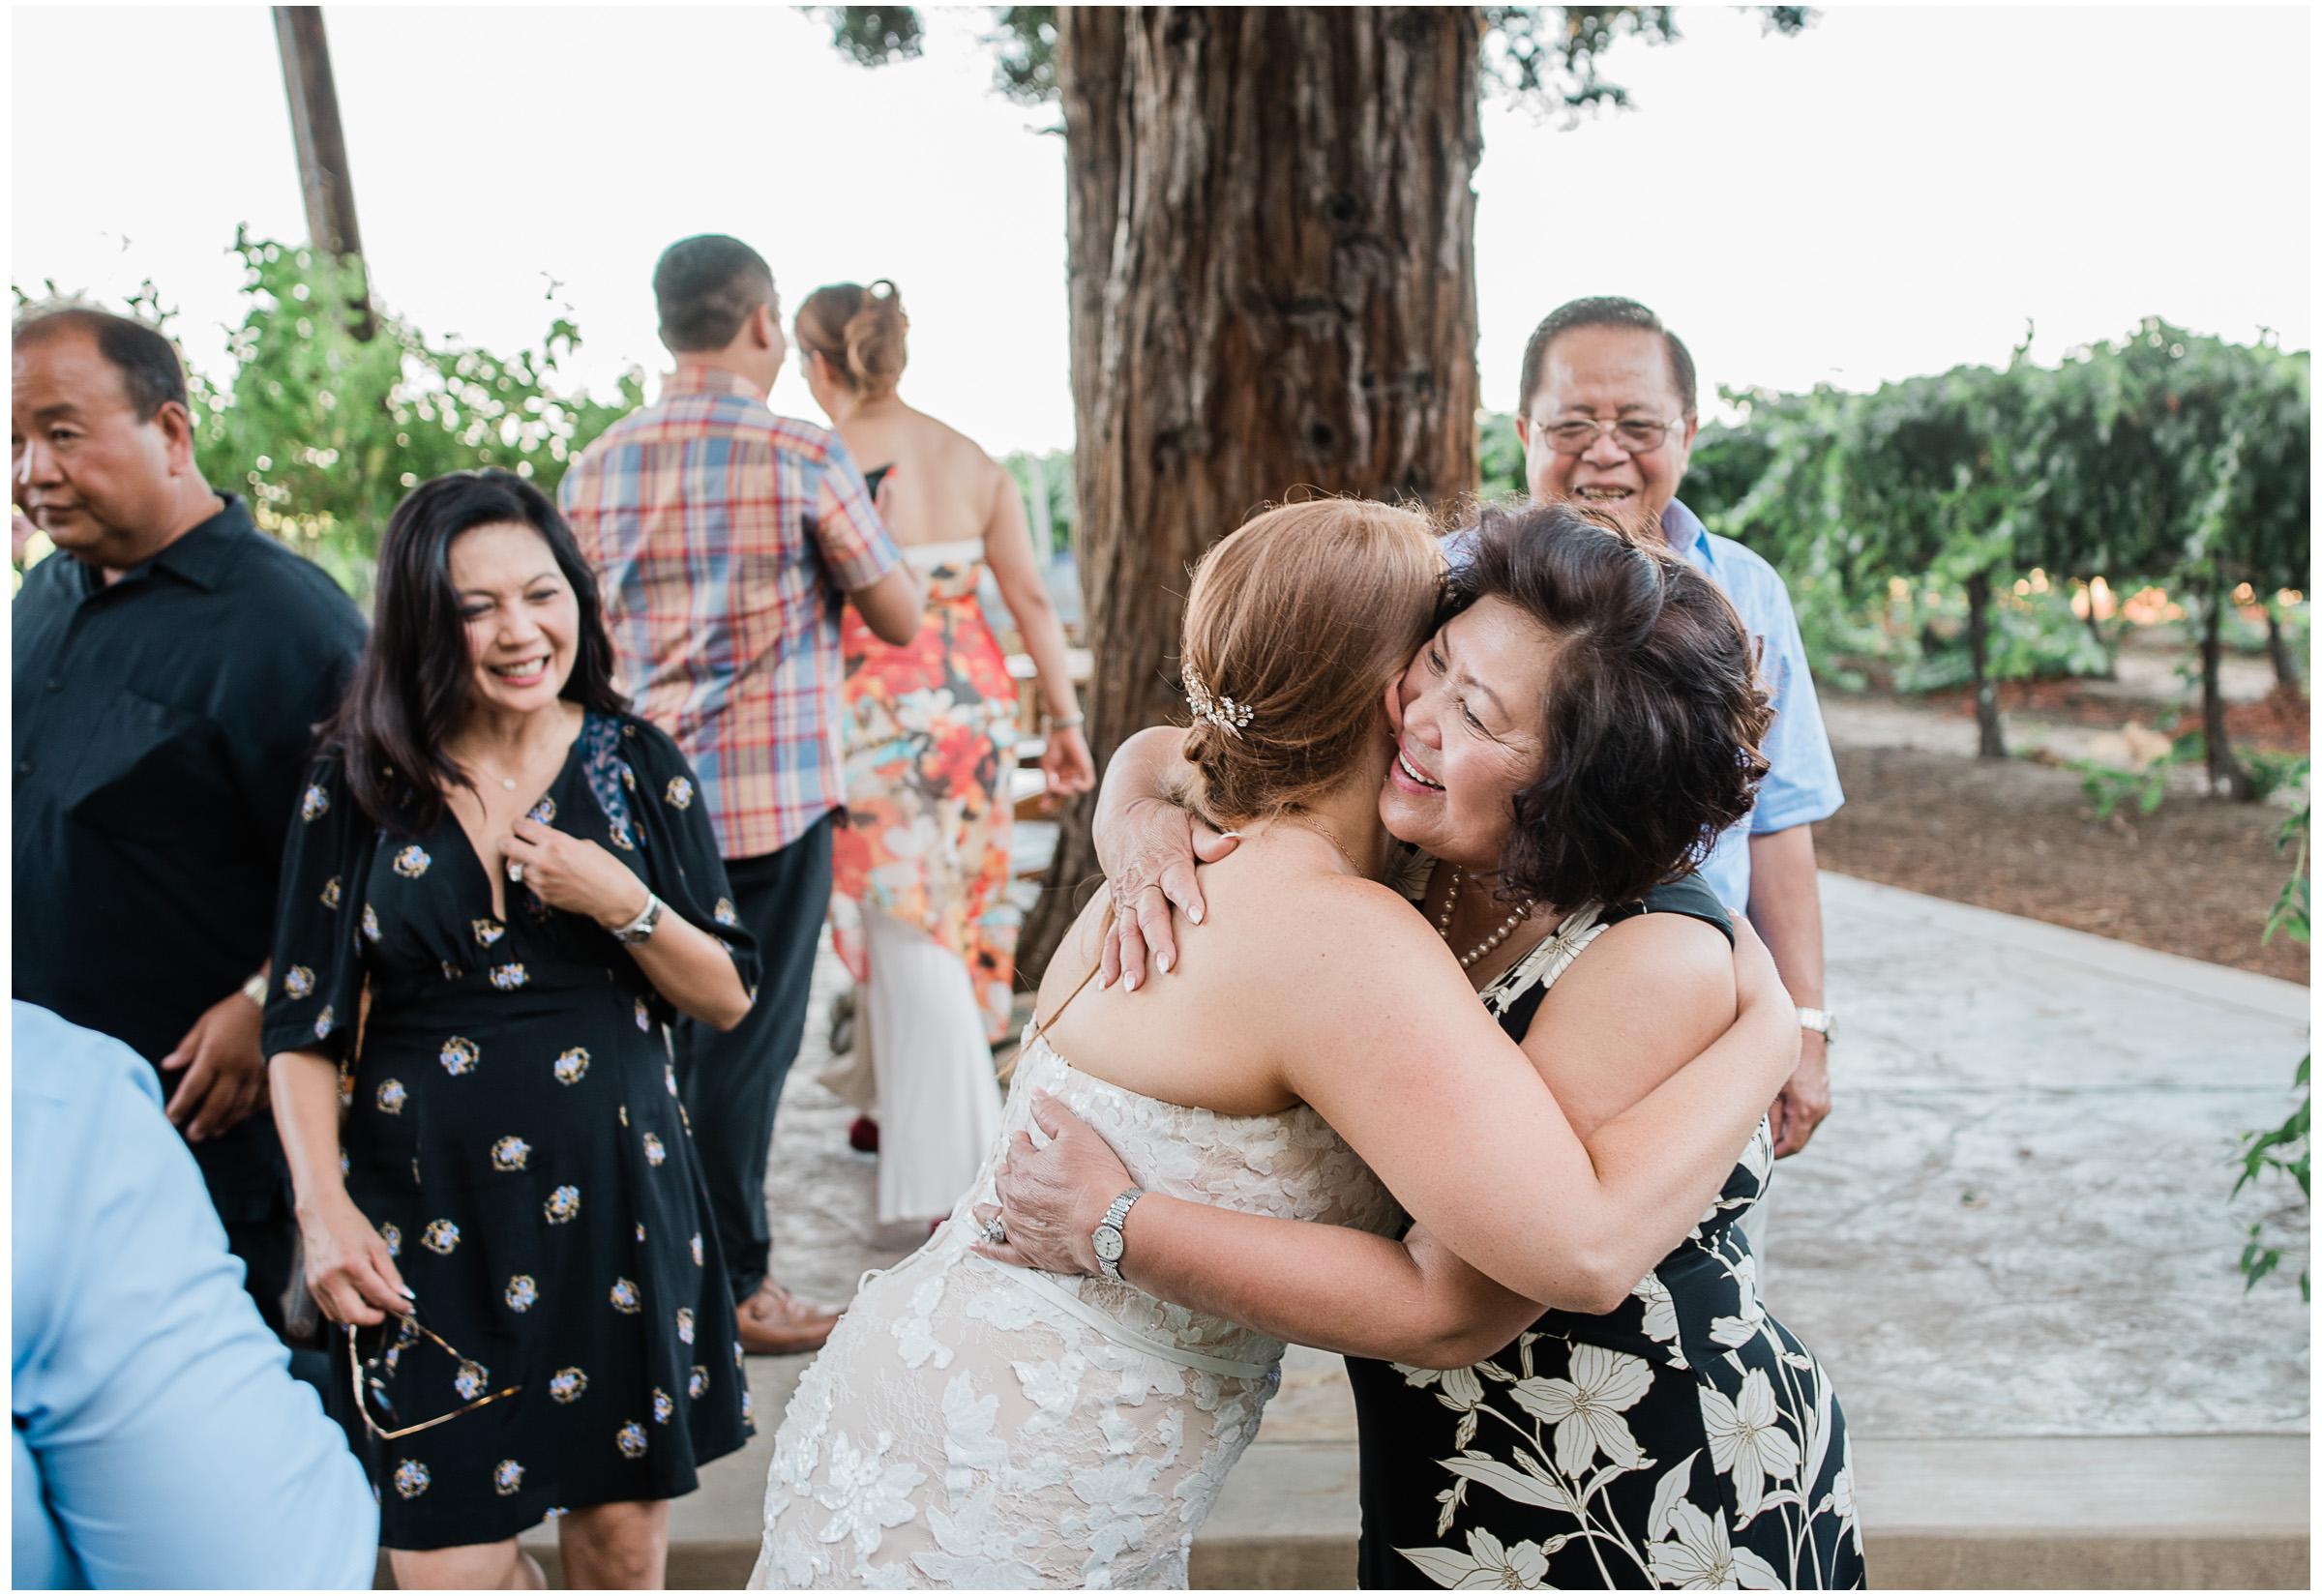 Clarksburg Wedding - Sacramento Photographer - Bogle Winery - Justin Wilcox Photography - 19.jpg